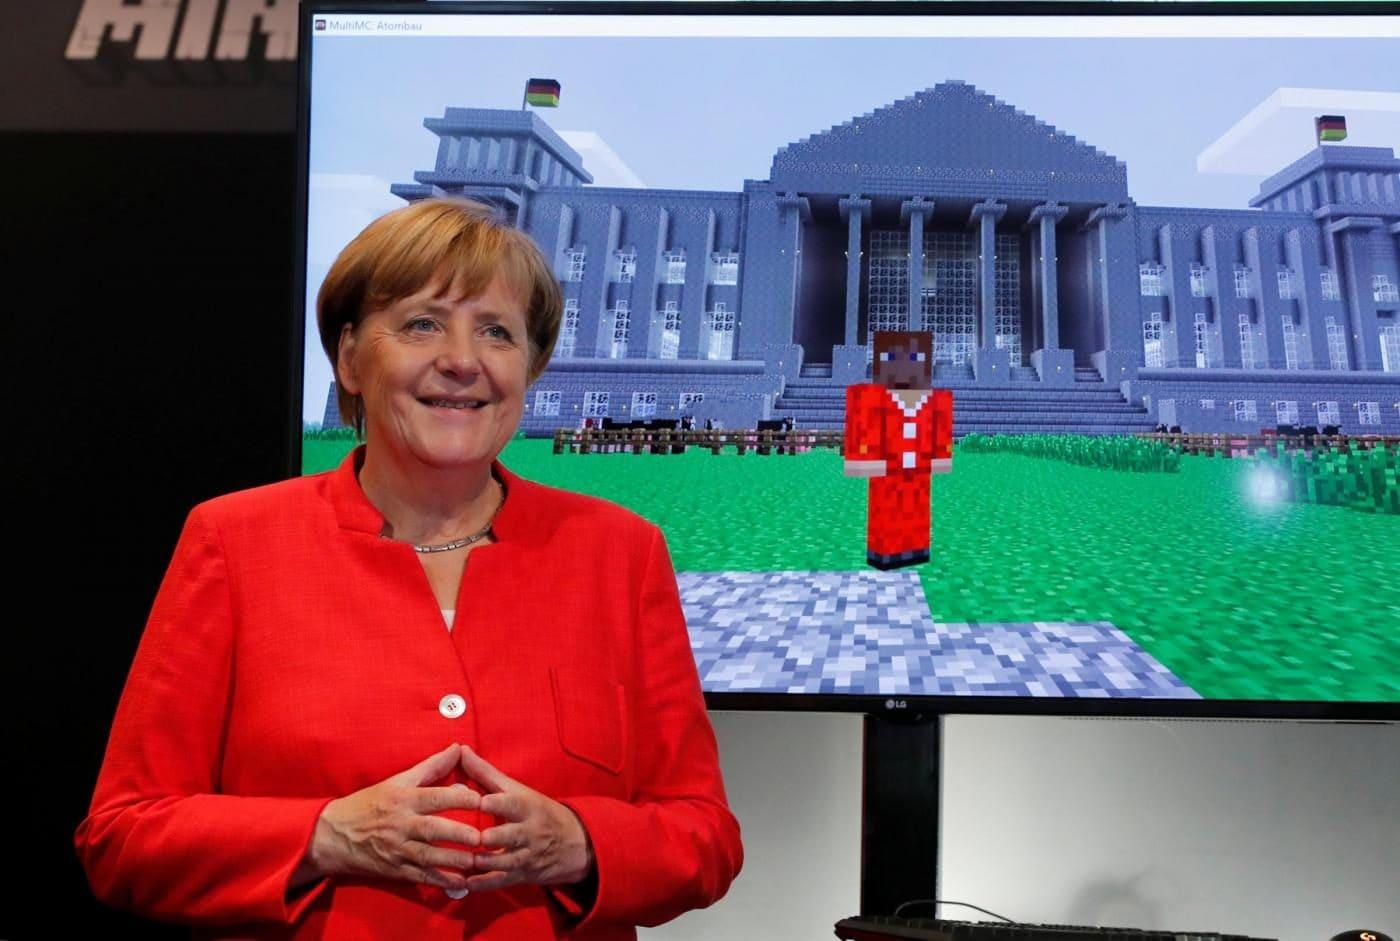 Angela merkel gamescom